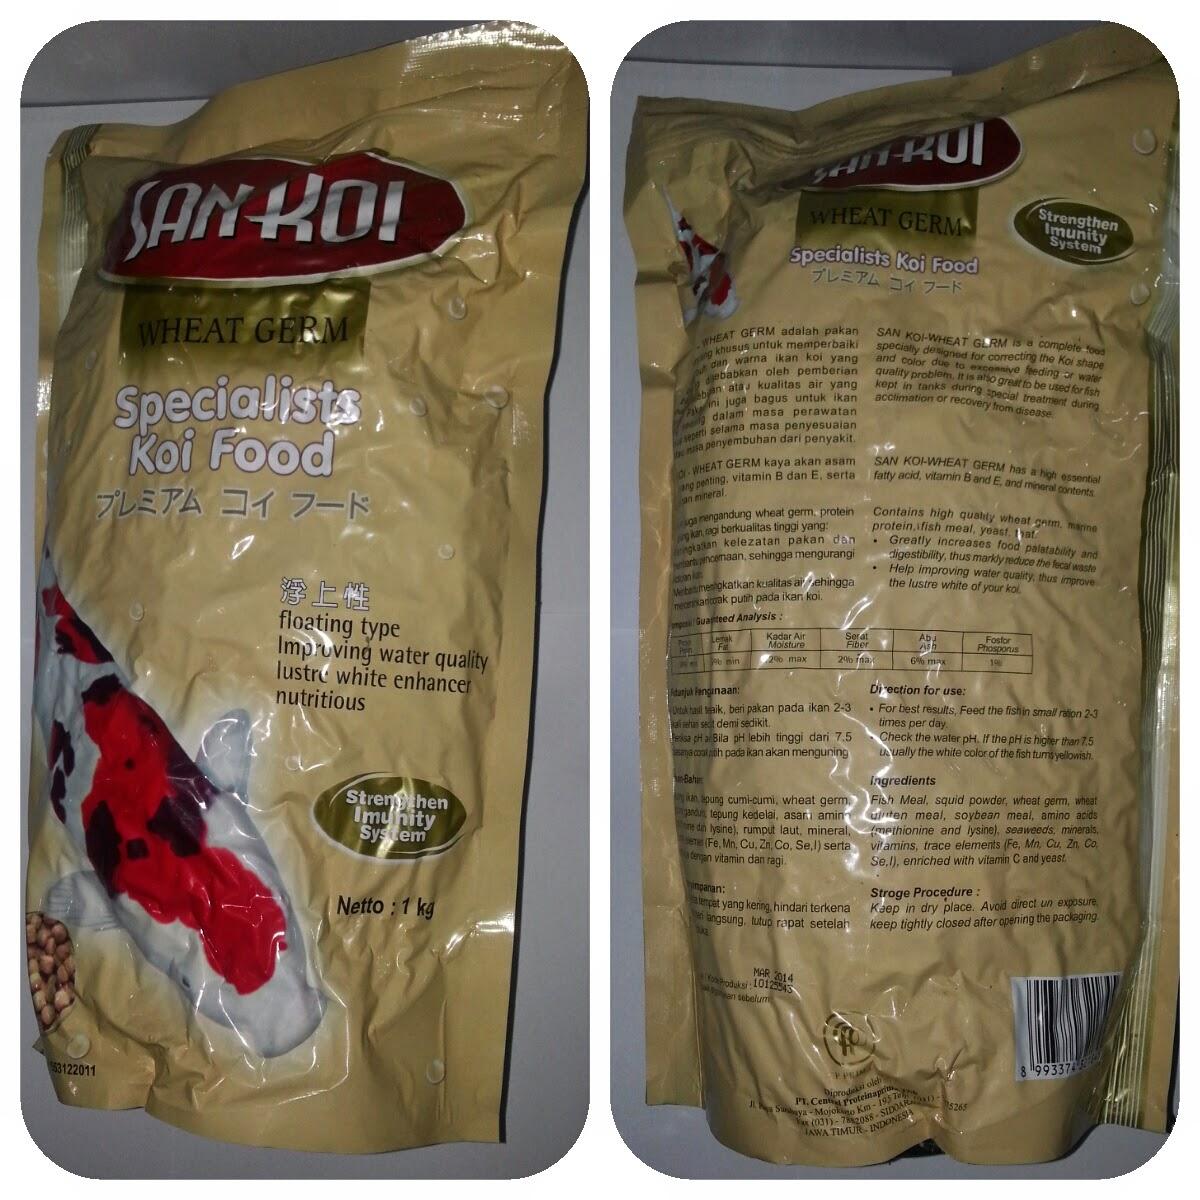 Cp Petfood Pakan Koi Pk 2mm Red 10kg Fish Food Daftar Update Harga San Wheat Germ 5mm 1kg